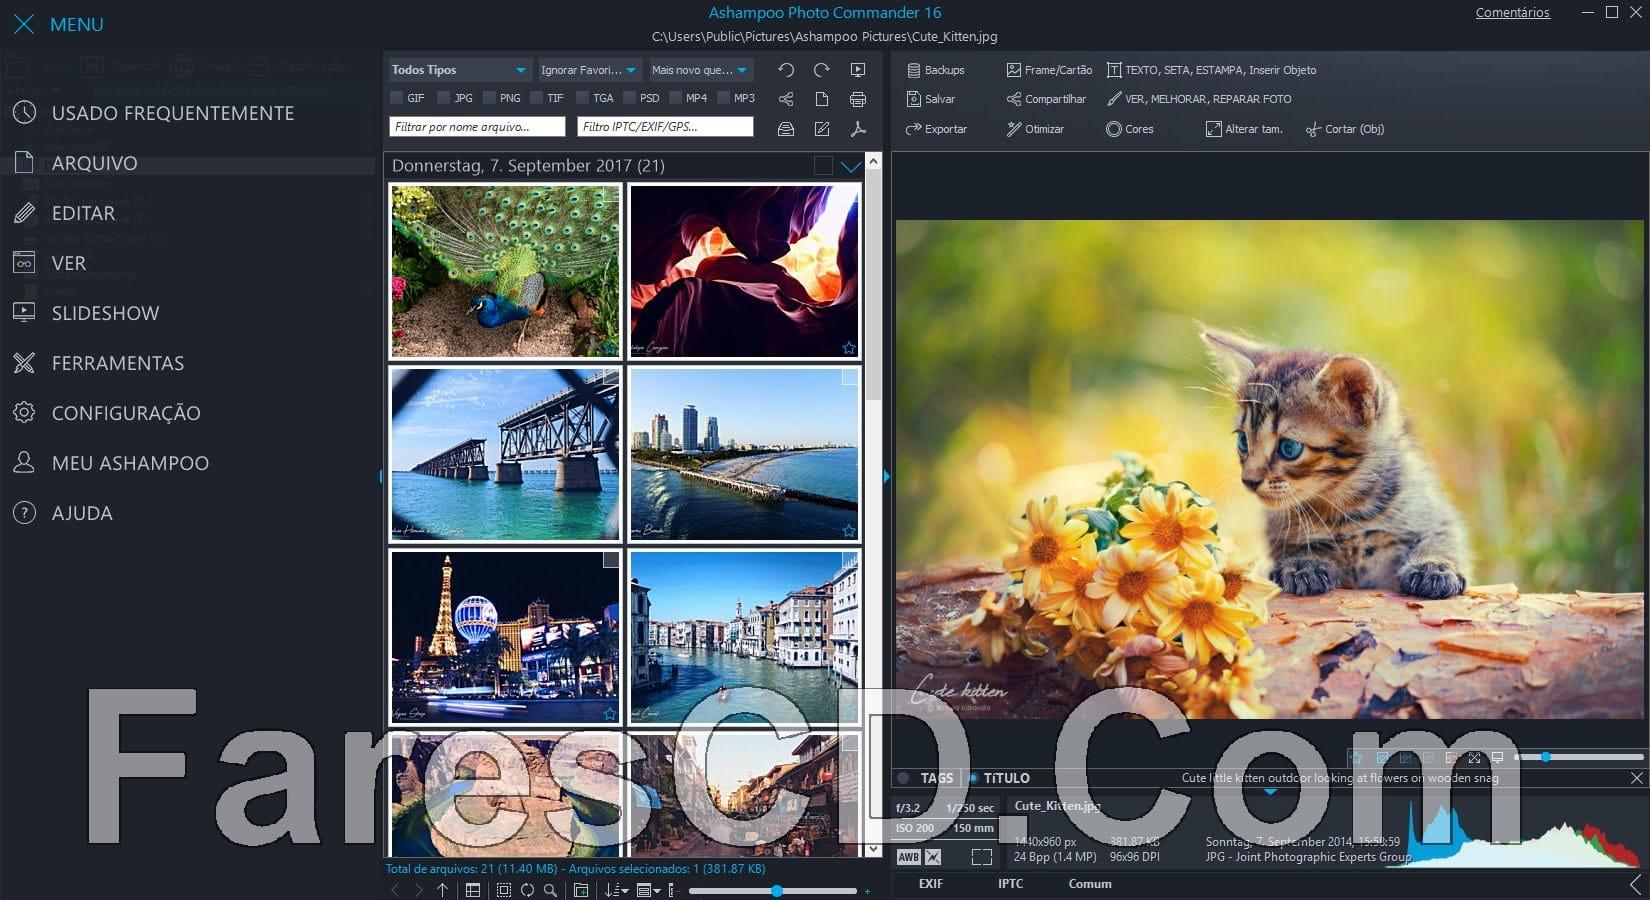 برنامج أشامبو لتعديل الصور | Ashampoo Photo Commander 16.0.1